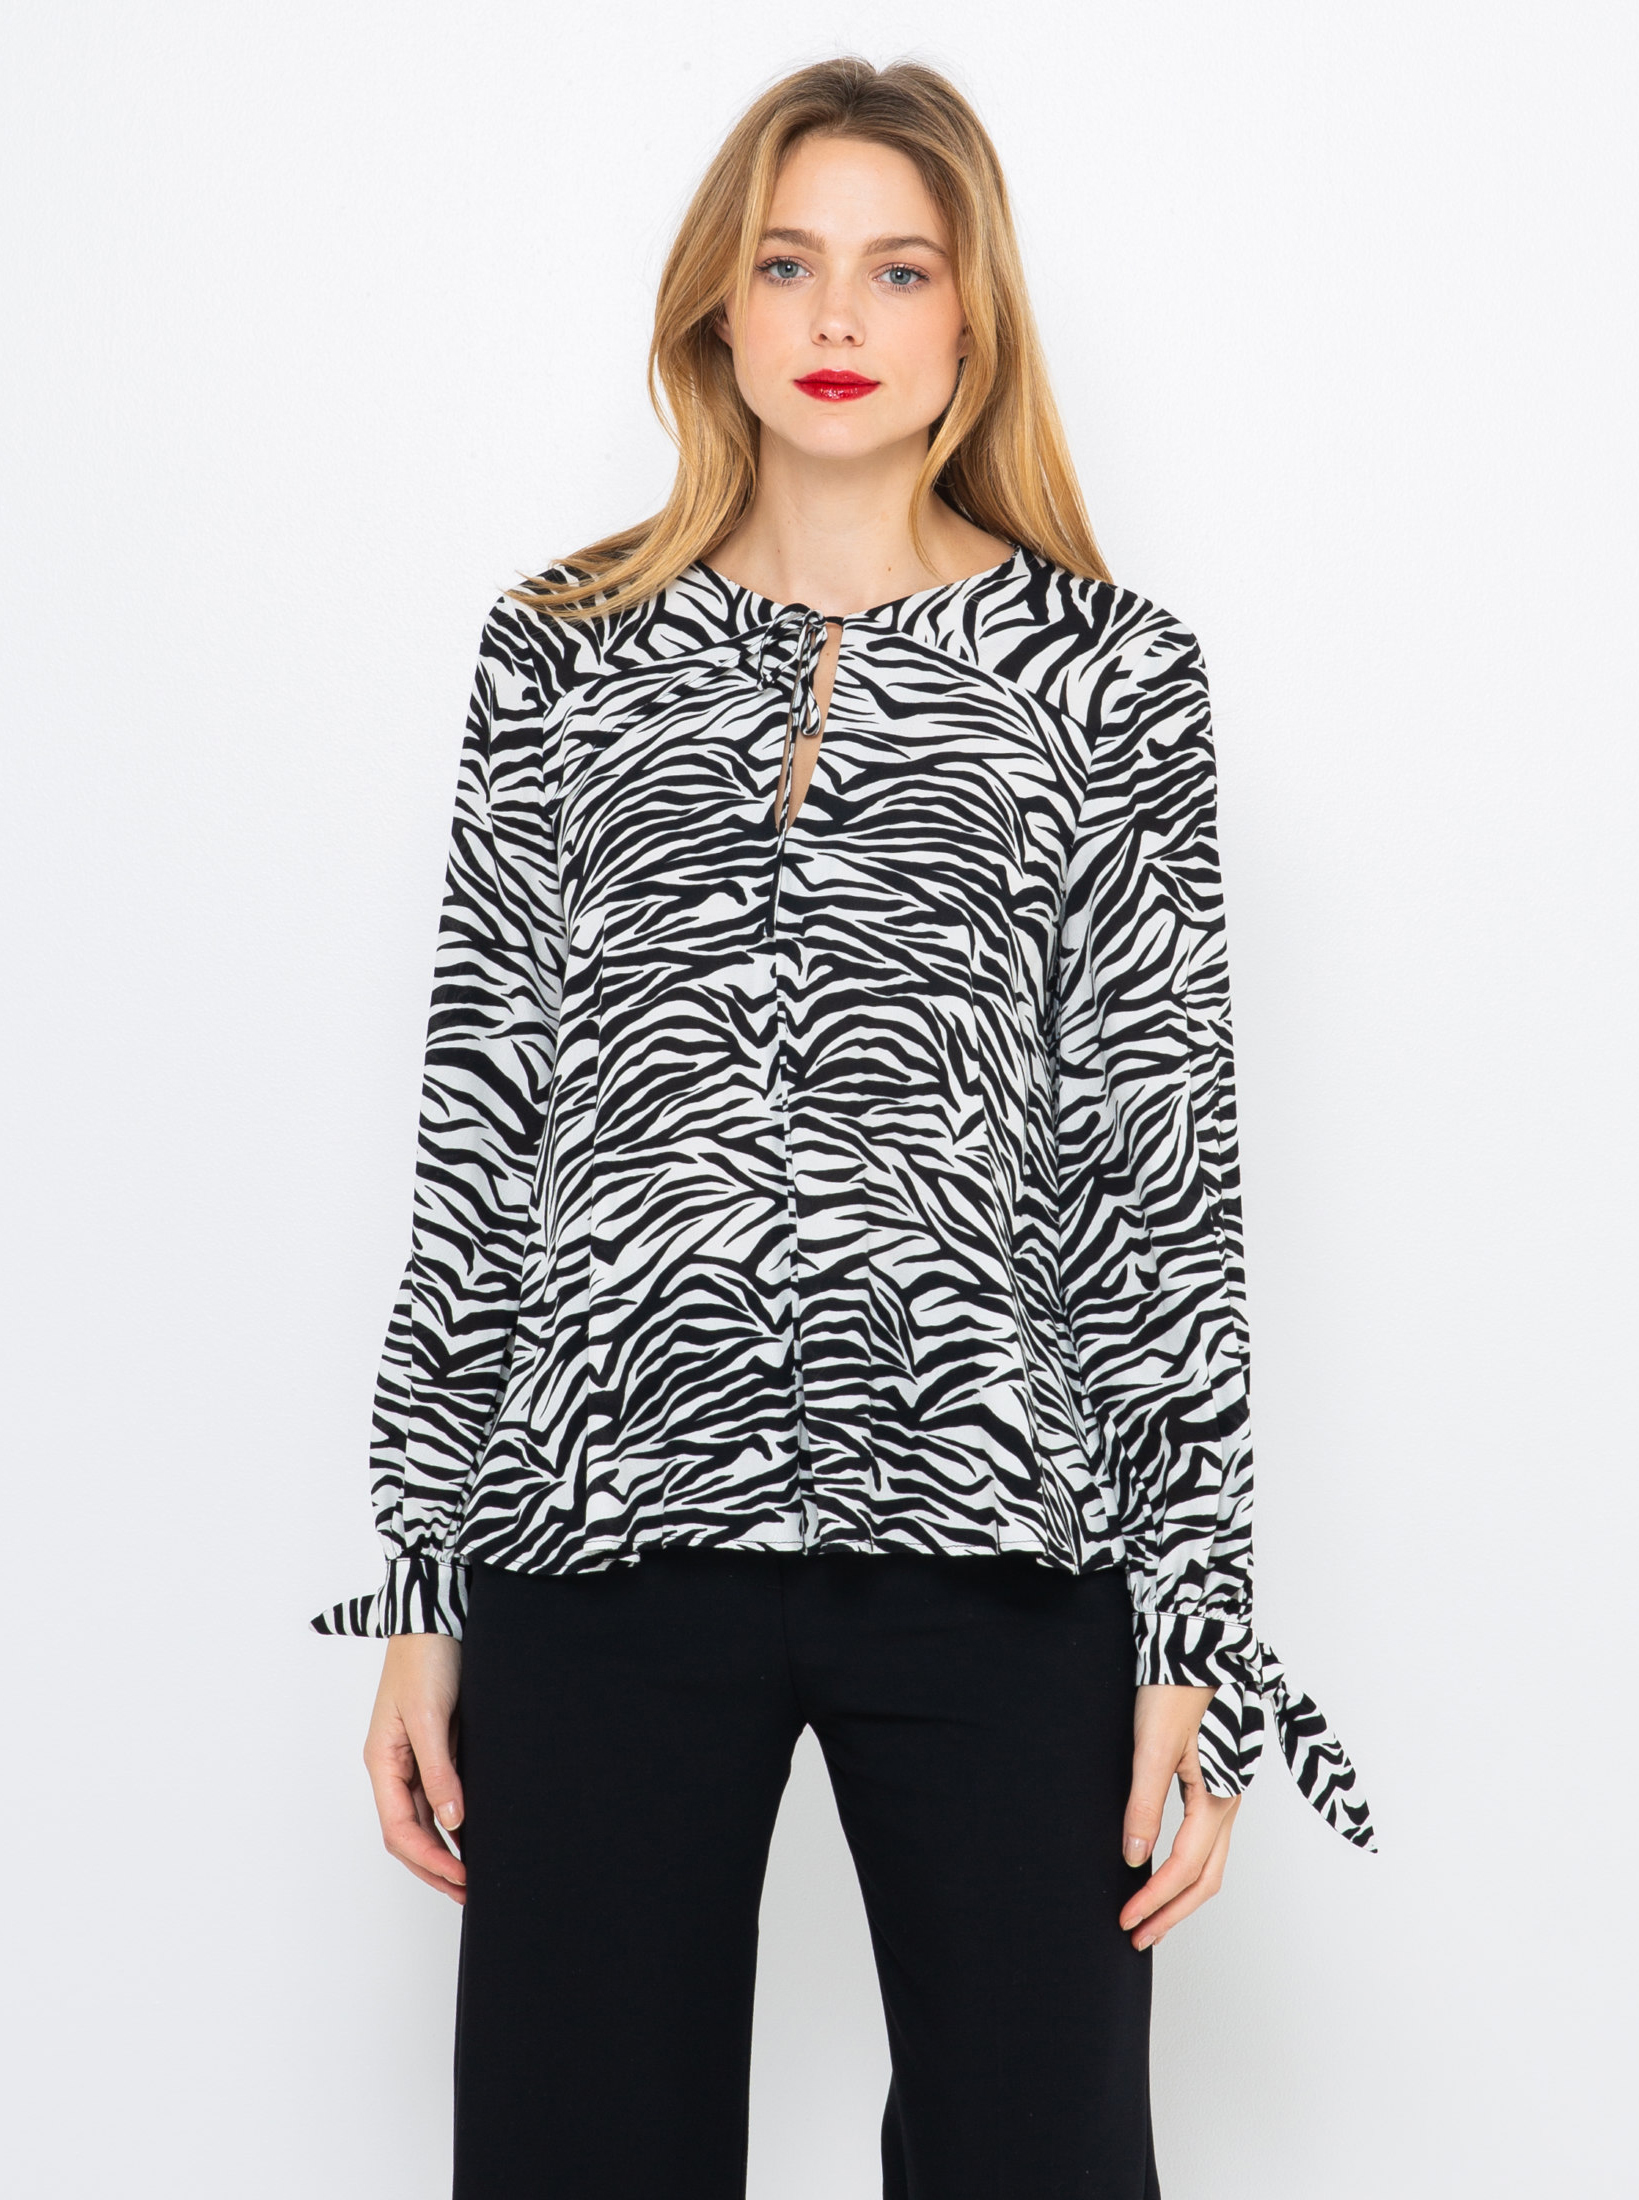 CAMAIEU black blouse with animal pattern